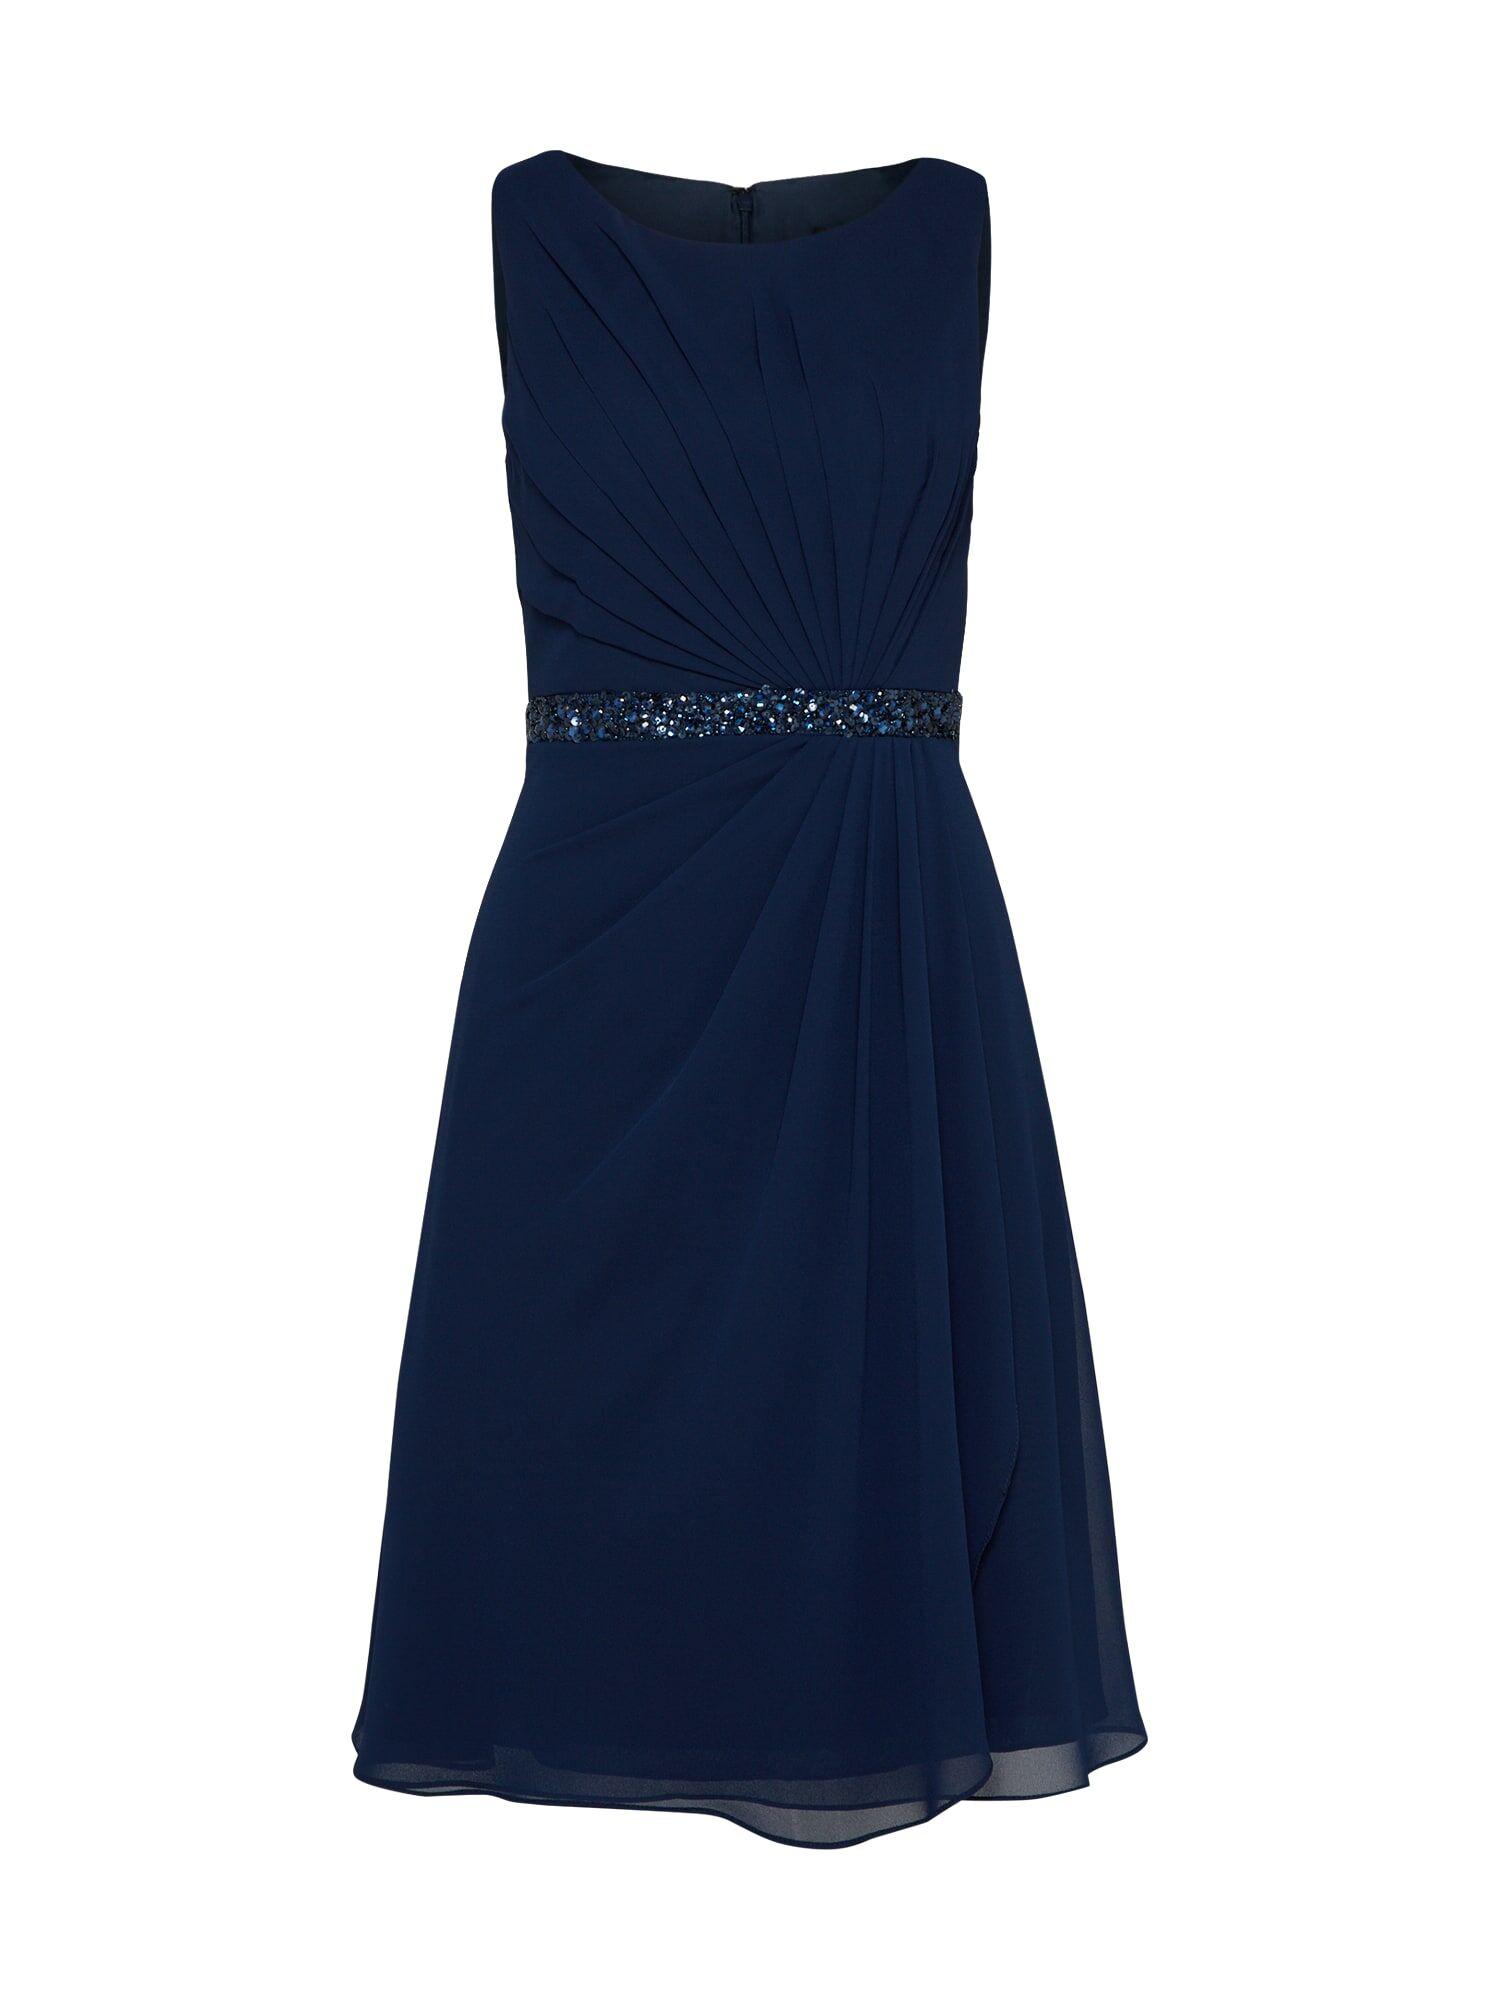 mascara Robe de cocktail 'MC181117'  - Bleu - Taille: 34 - female